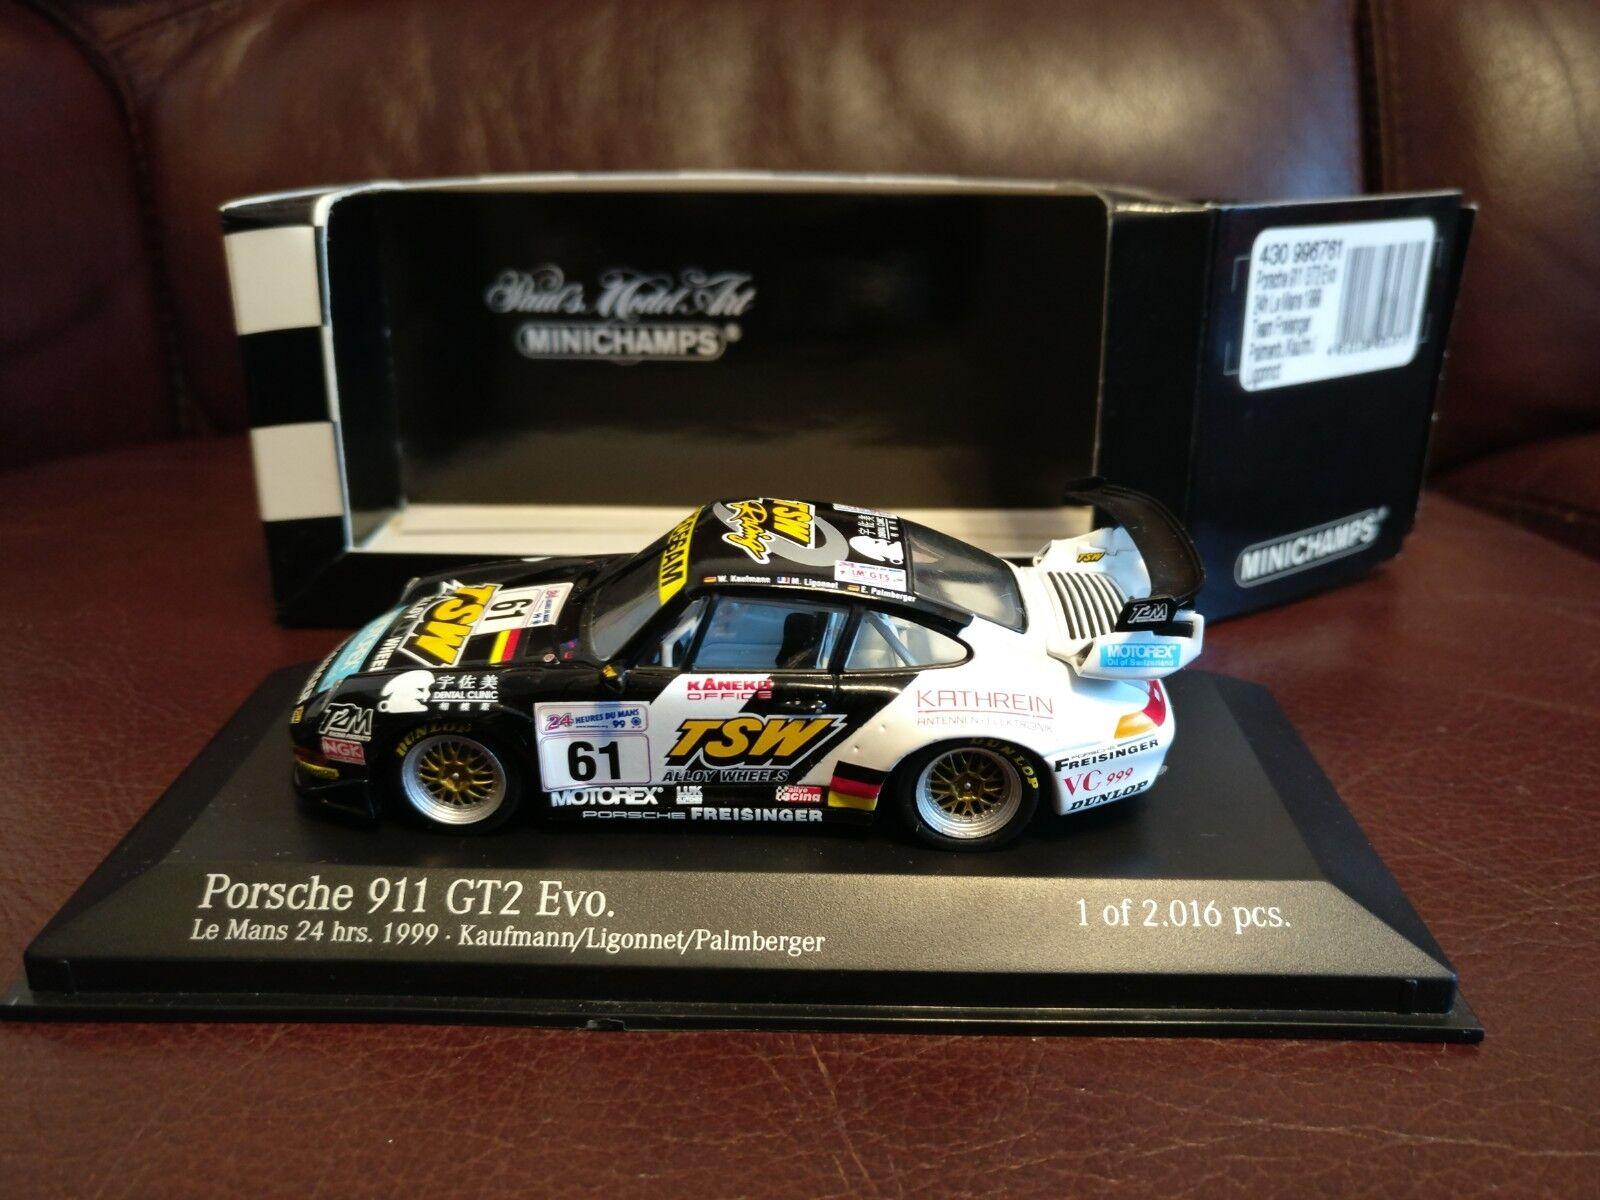 Minichamps PORSCHE 911 GT2 EVO (993) Le Mans 24 HR 1999  61 modello 1 43 MOLTO RARO